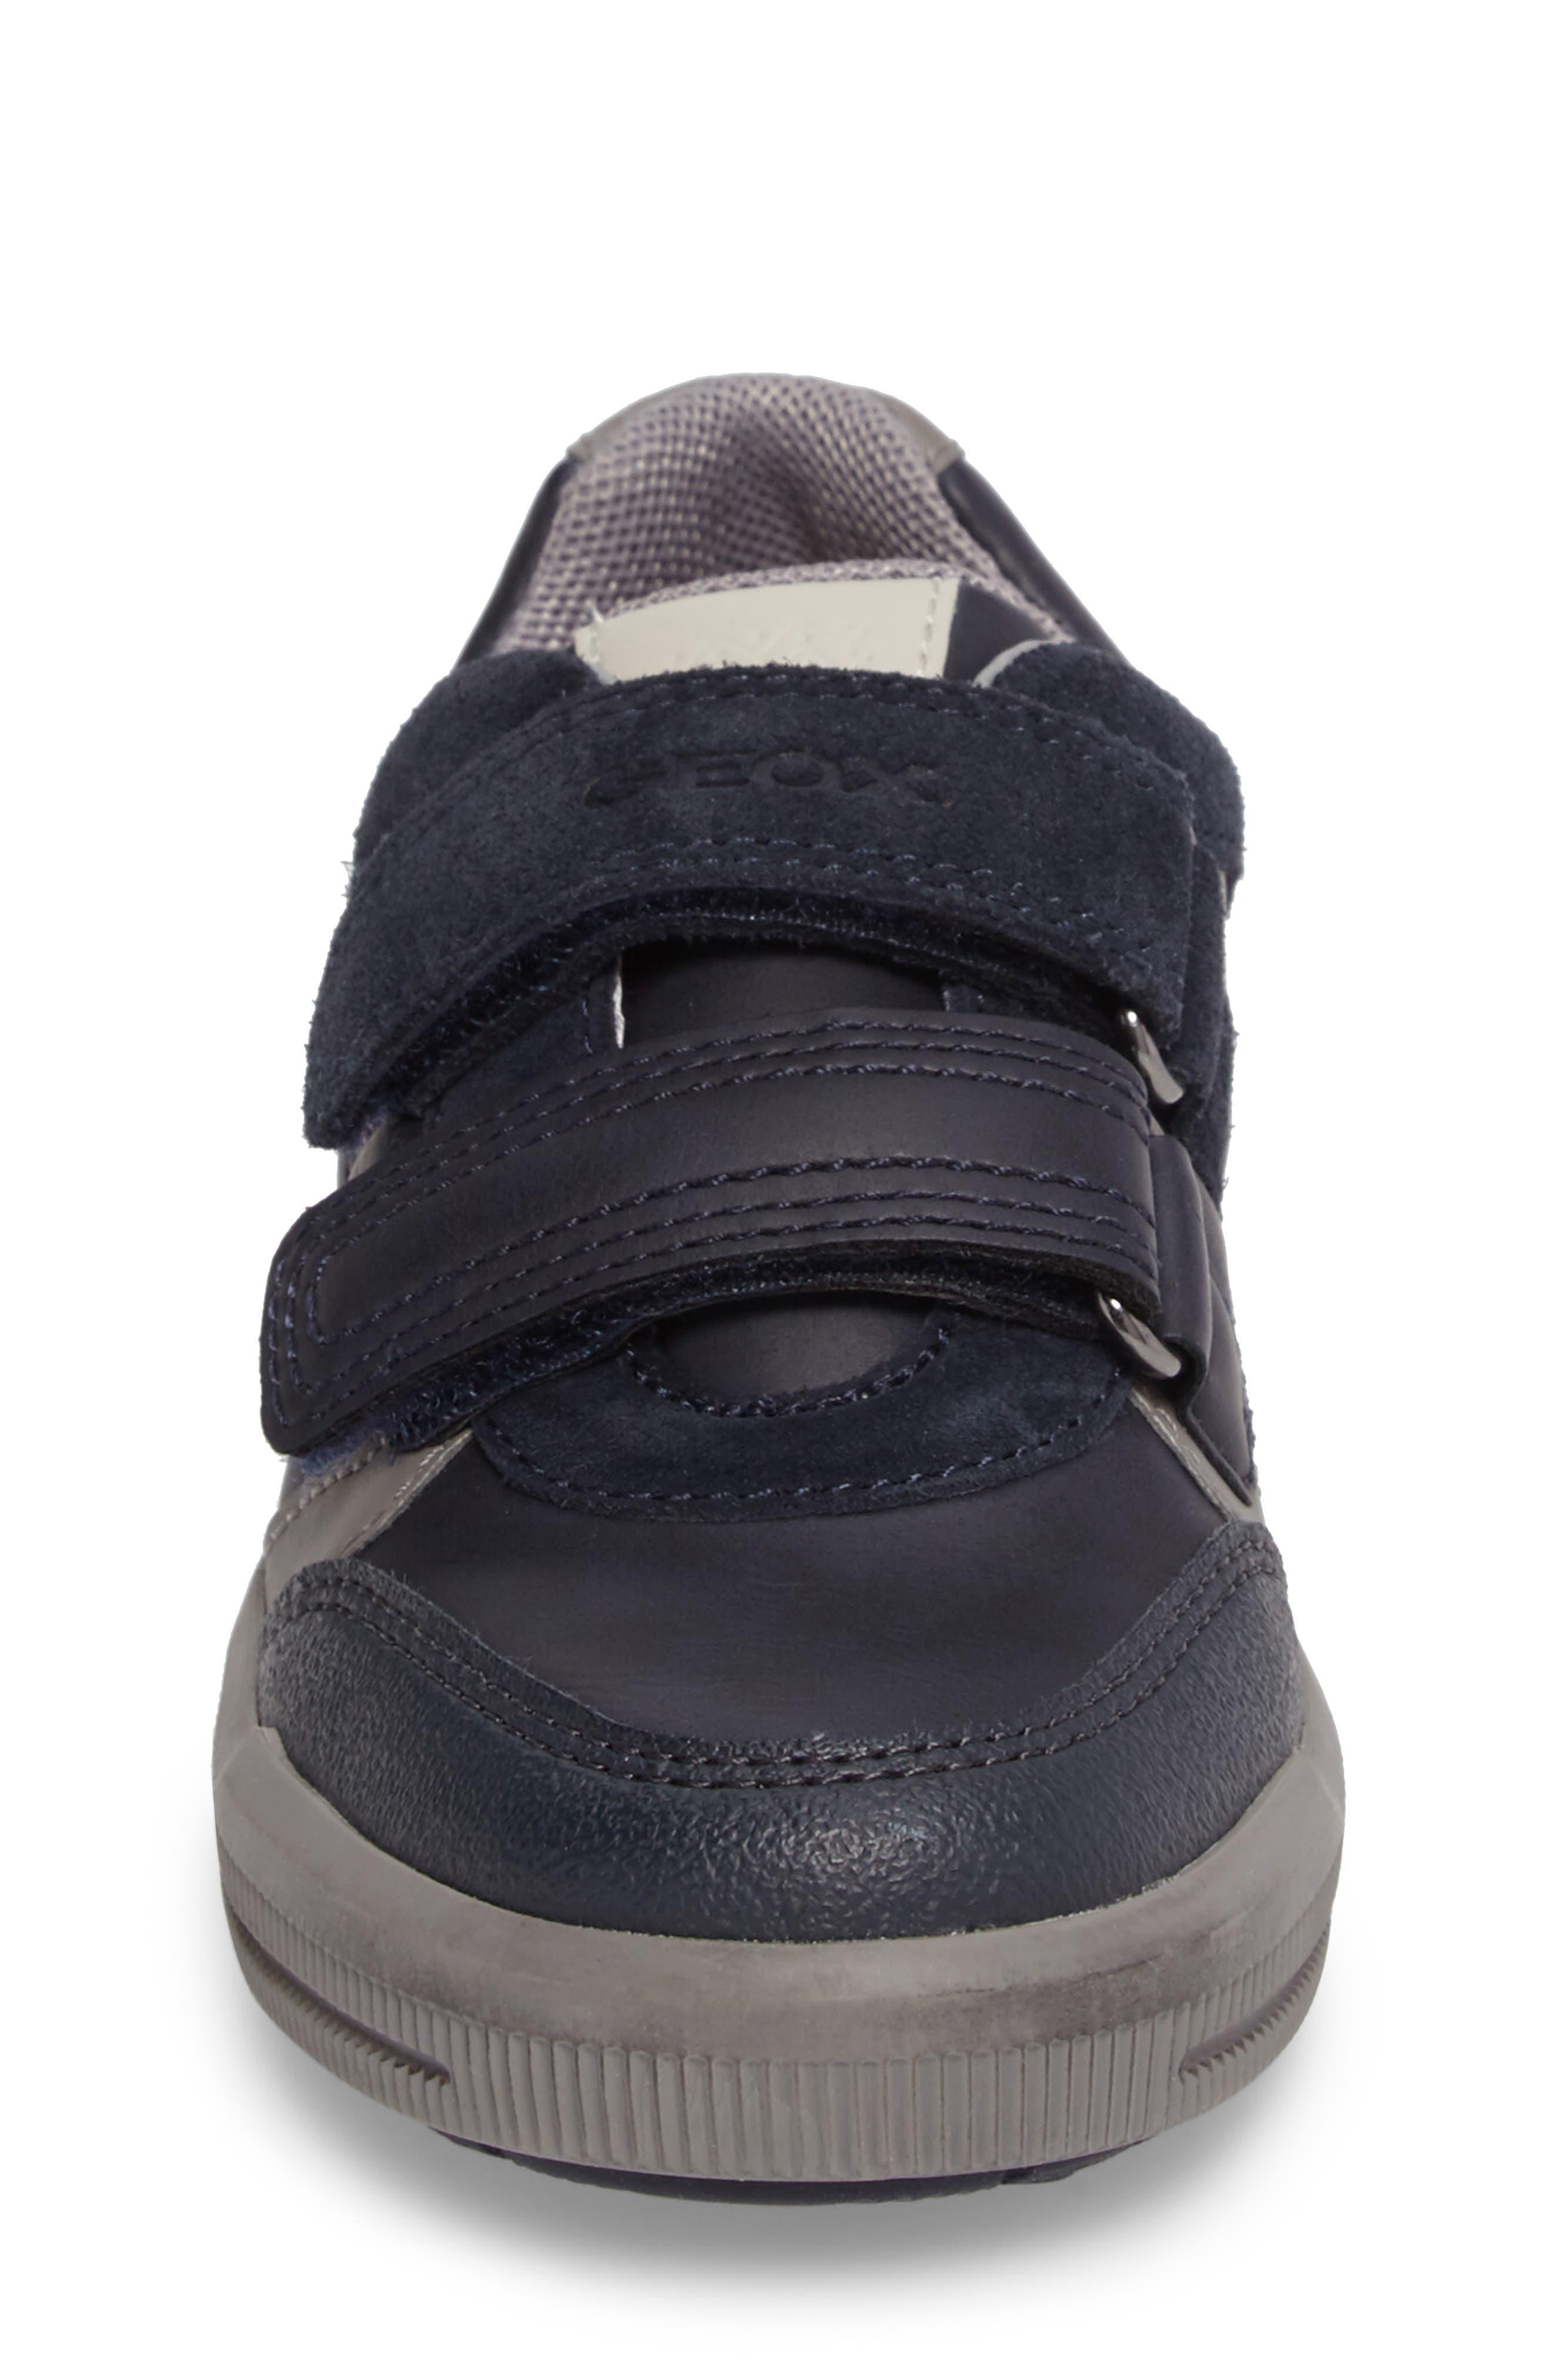 Alternate Image 4  - Geox Jr Arzach Sneaker (Toddler, Little Kid & Big Kid)